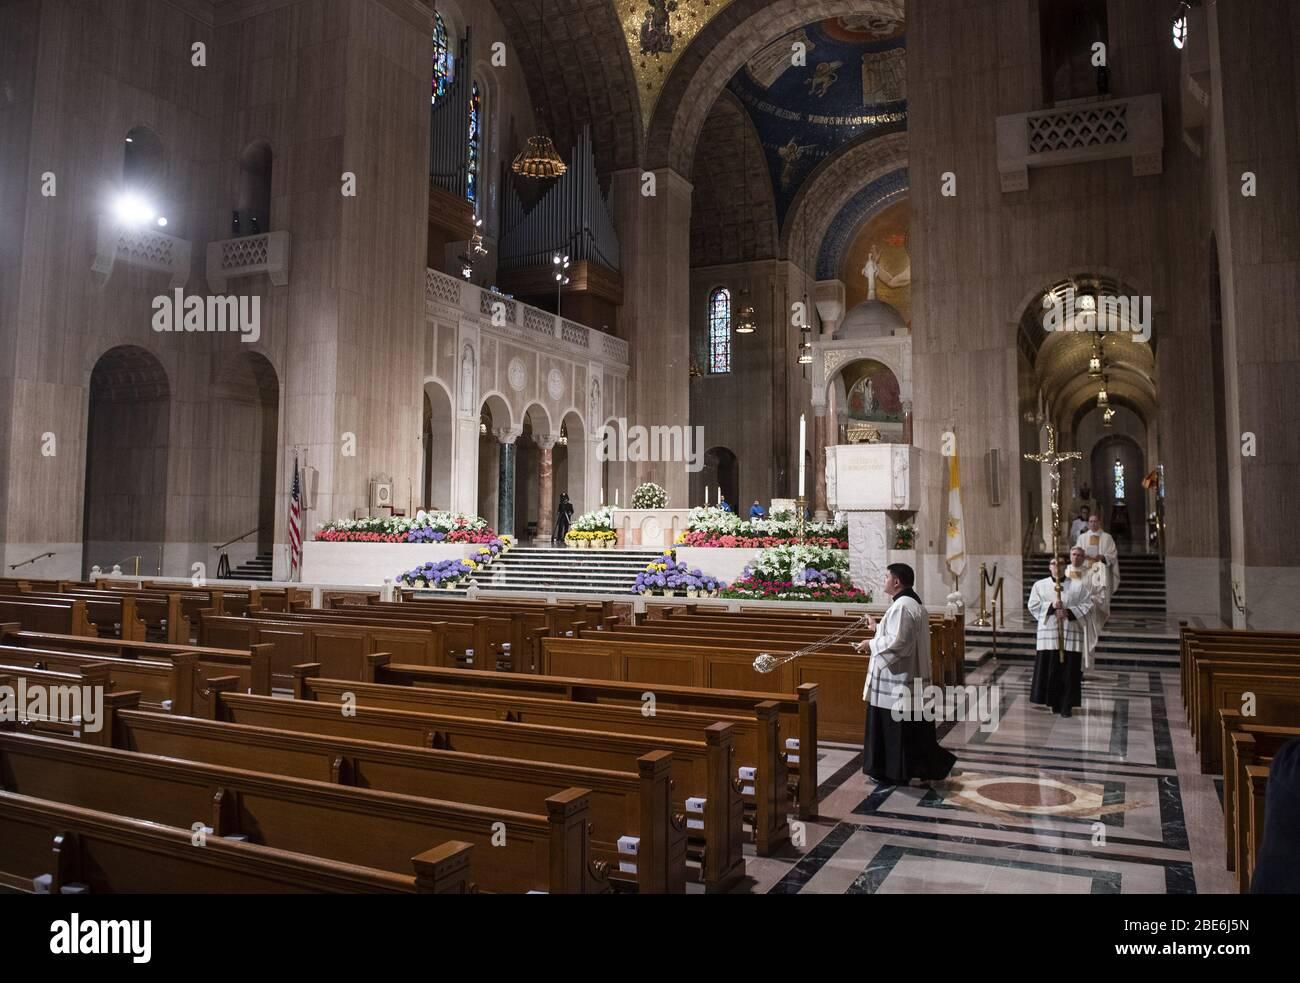 Wash Dc Shrine 2020 Christmas Concert Washignton, United States. 12th Apr, 2020. The Basilica of the